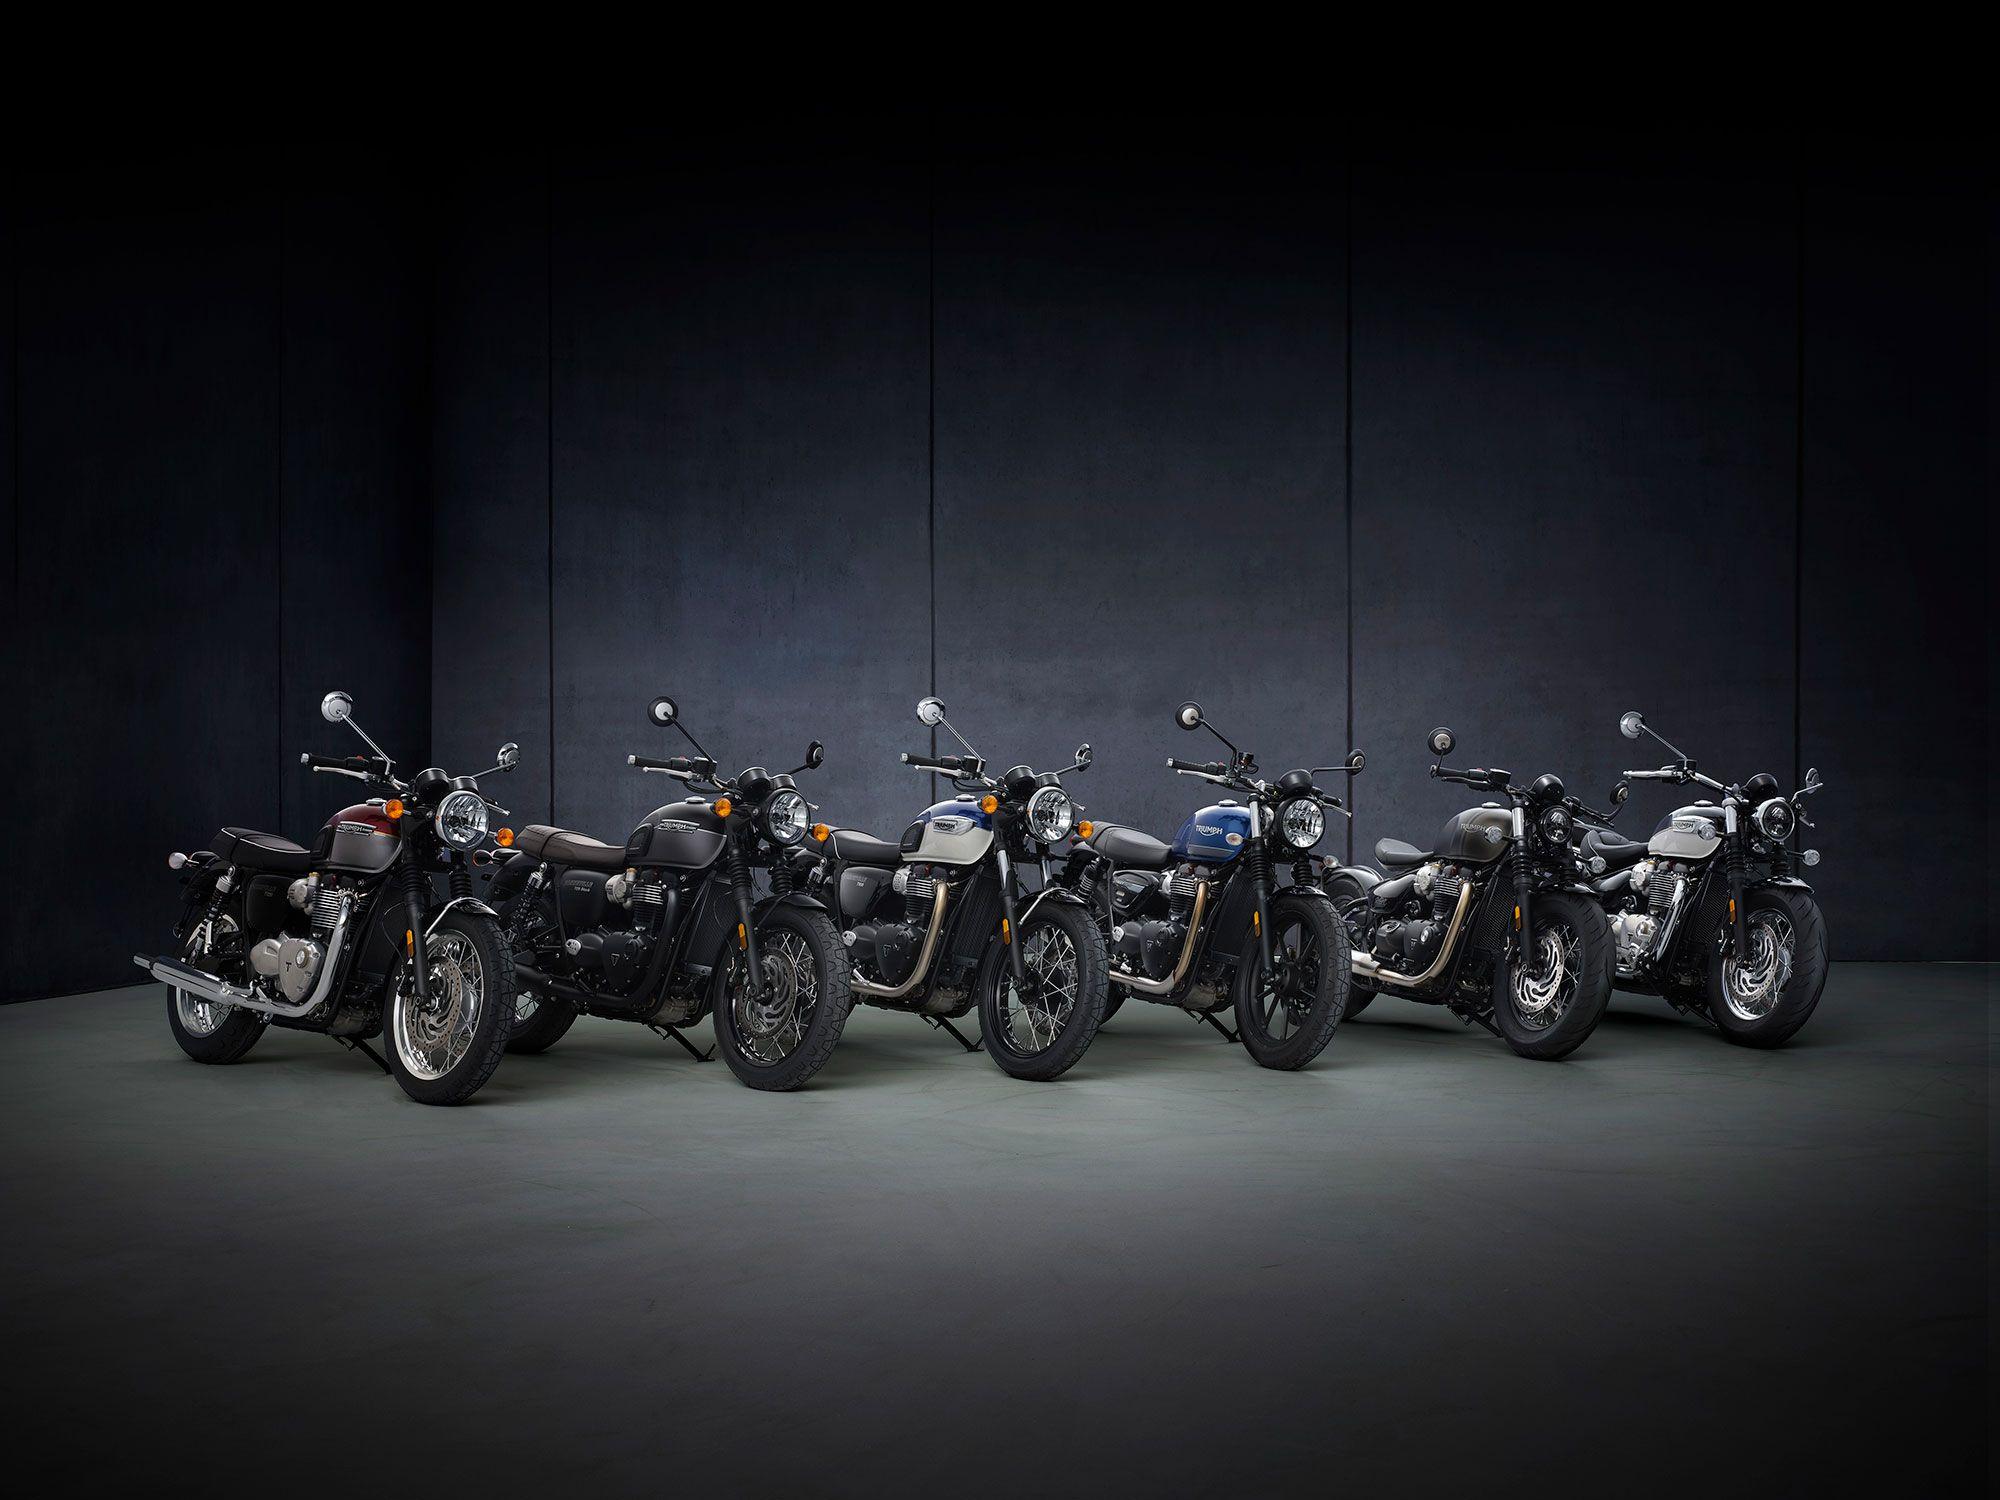 The entire Triumph Bonneville lineup gets reworked for 2021.